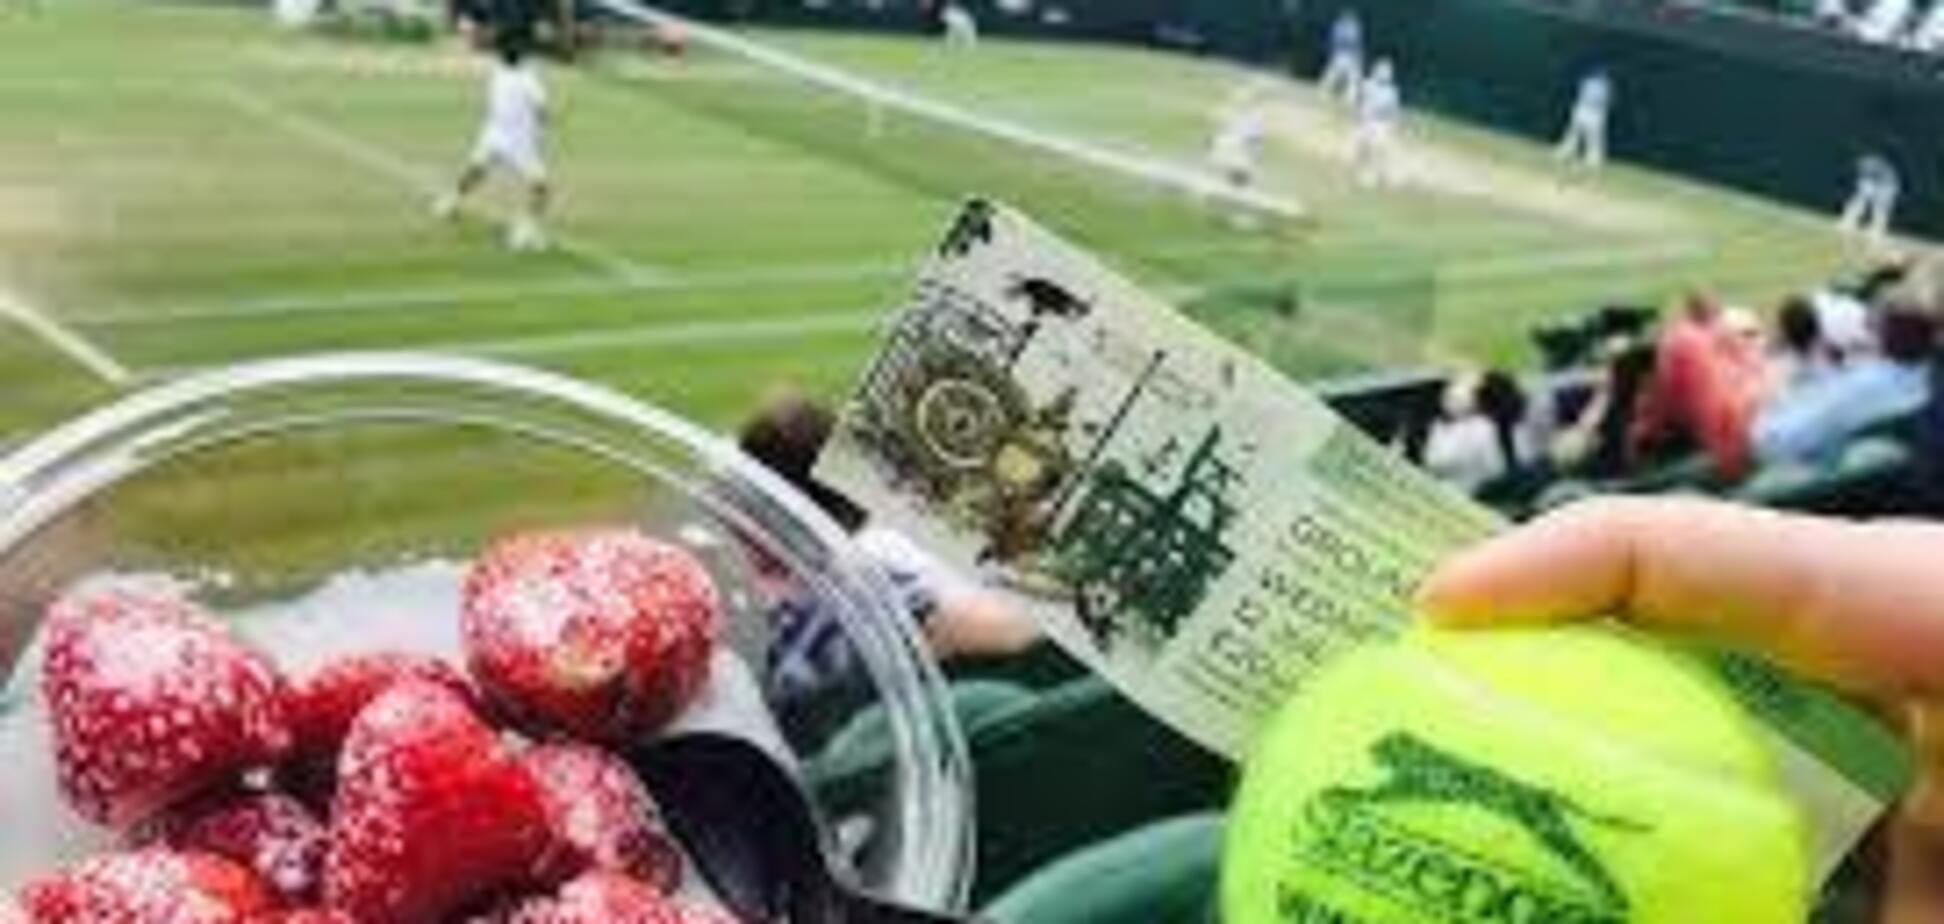 Wimbledon-2019: статистика закулисной жизни турнира Большого шлема